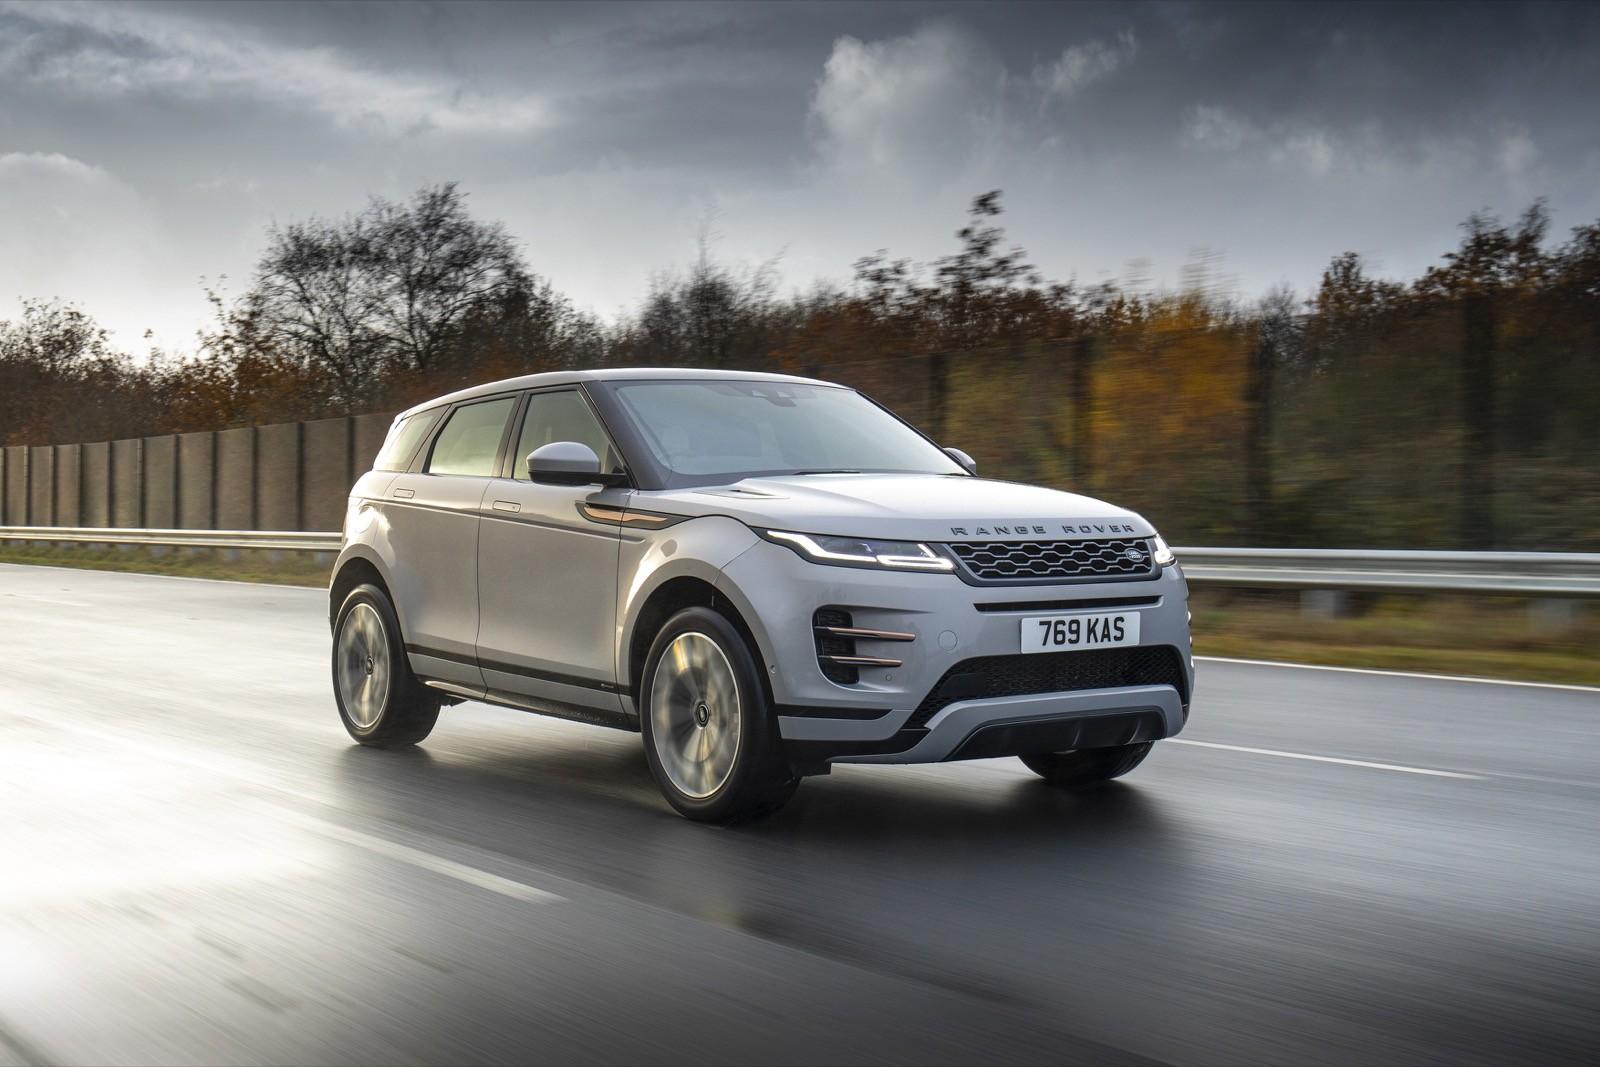 Range Rover Evoque PHEV 2020